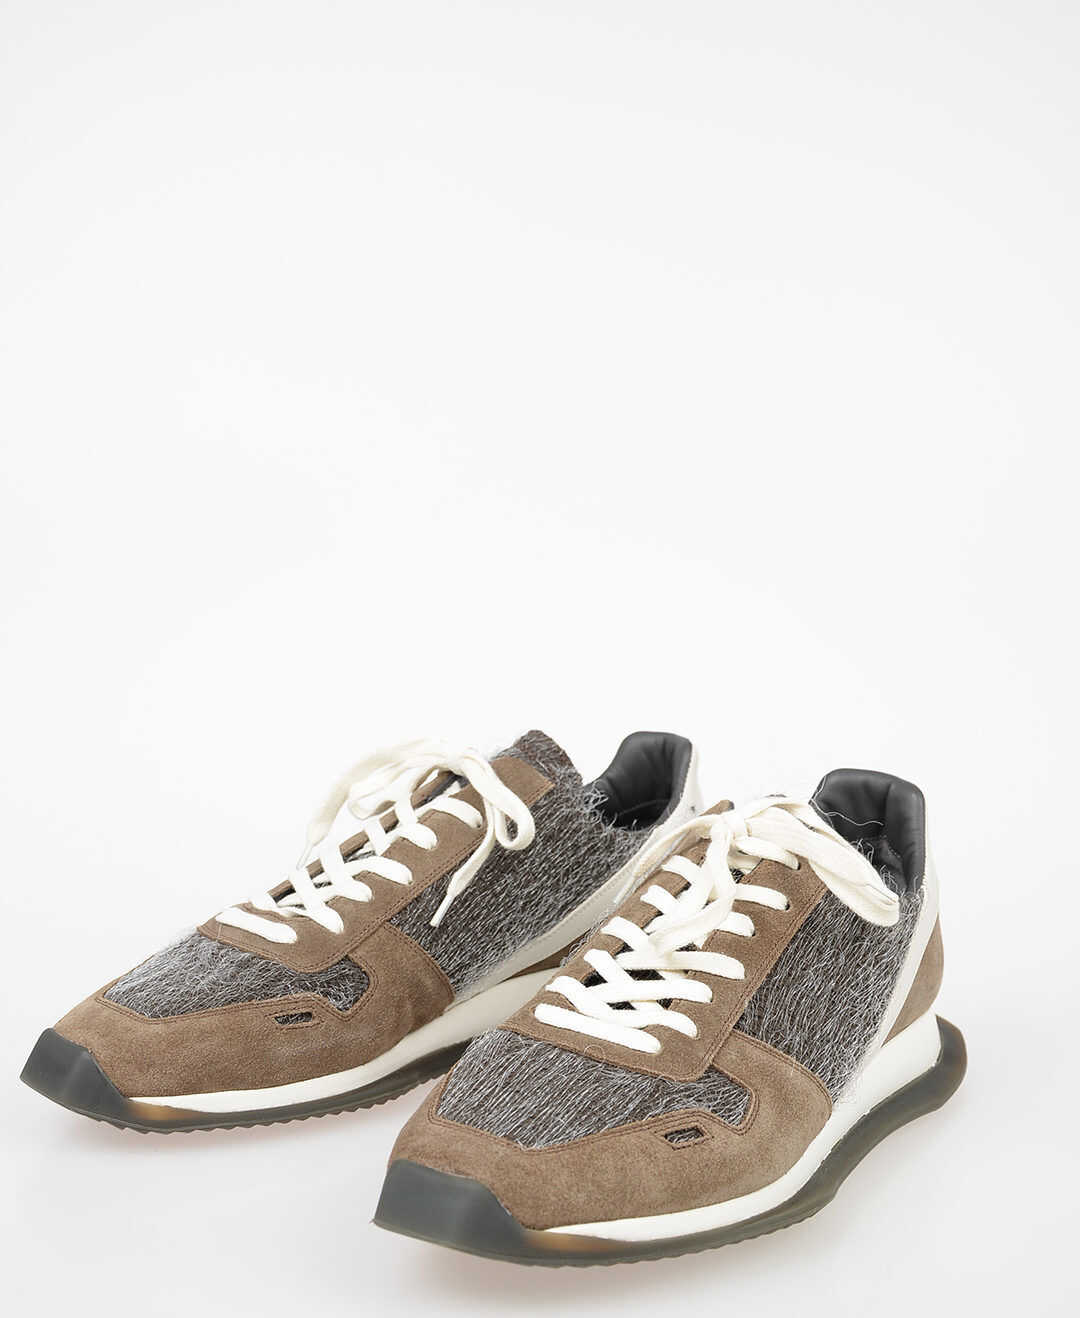 Rick Owens Fabric Leather RUNNER Sneakers DARKDUST/MILK/DARK WHITE